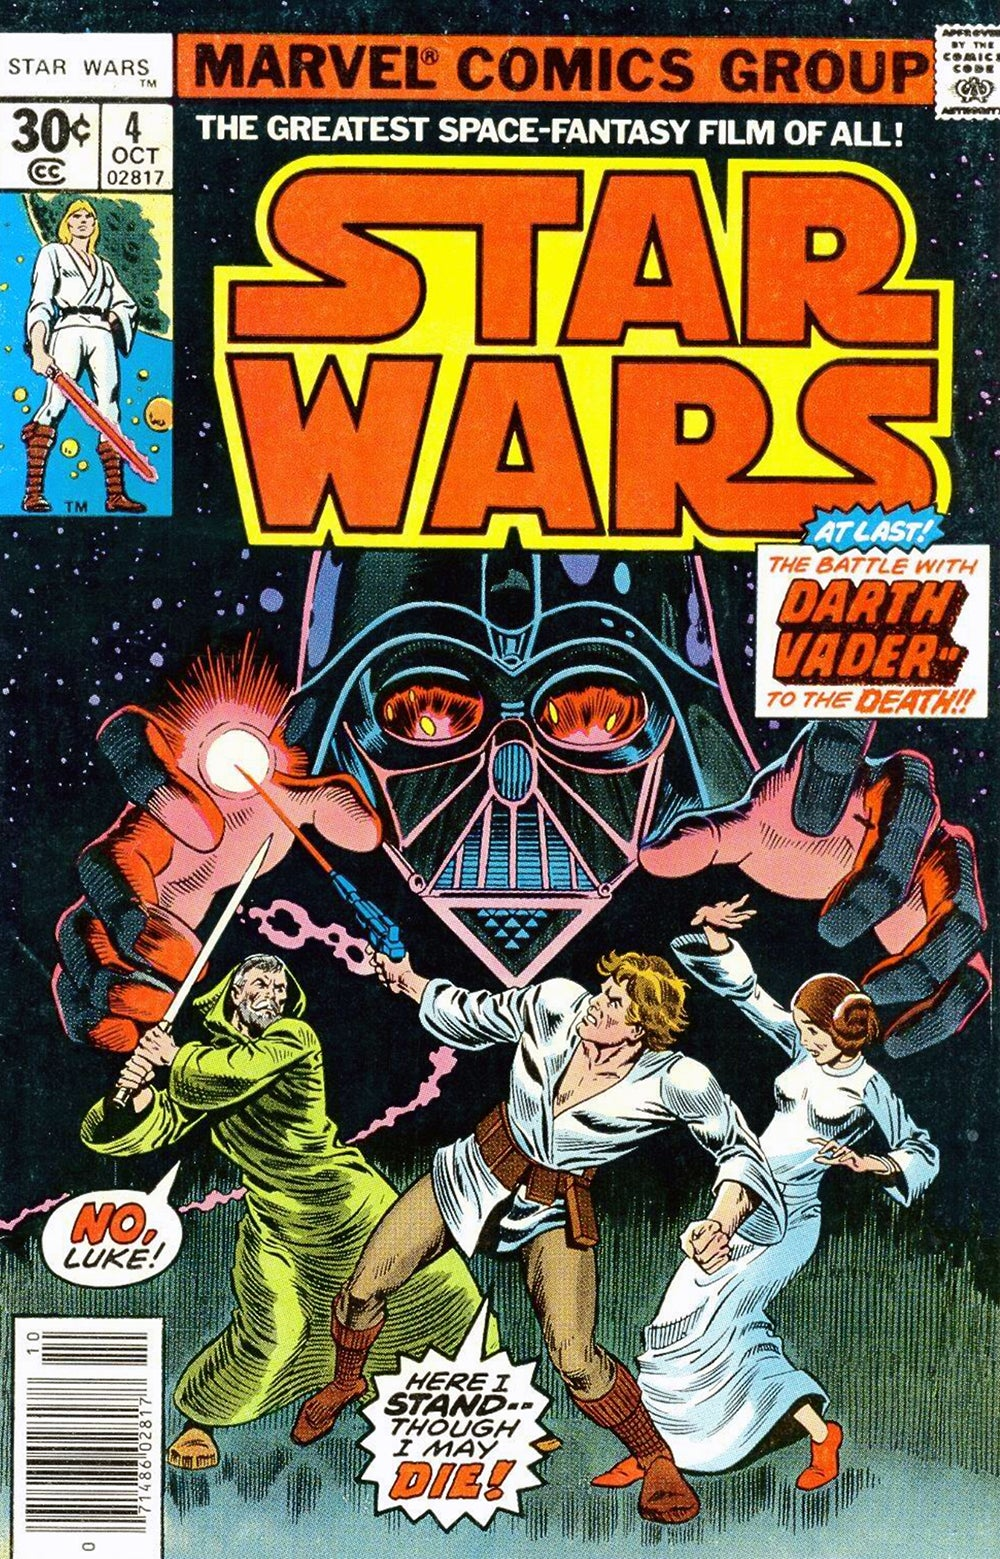 Touring Marvel S Star Wars 4 Explodey Wan Kenobi